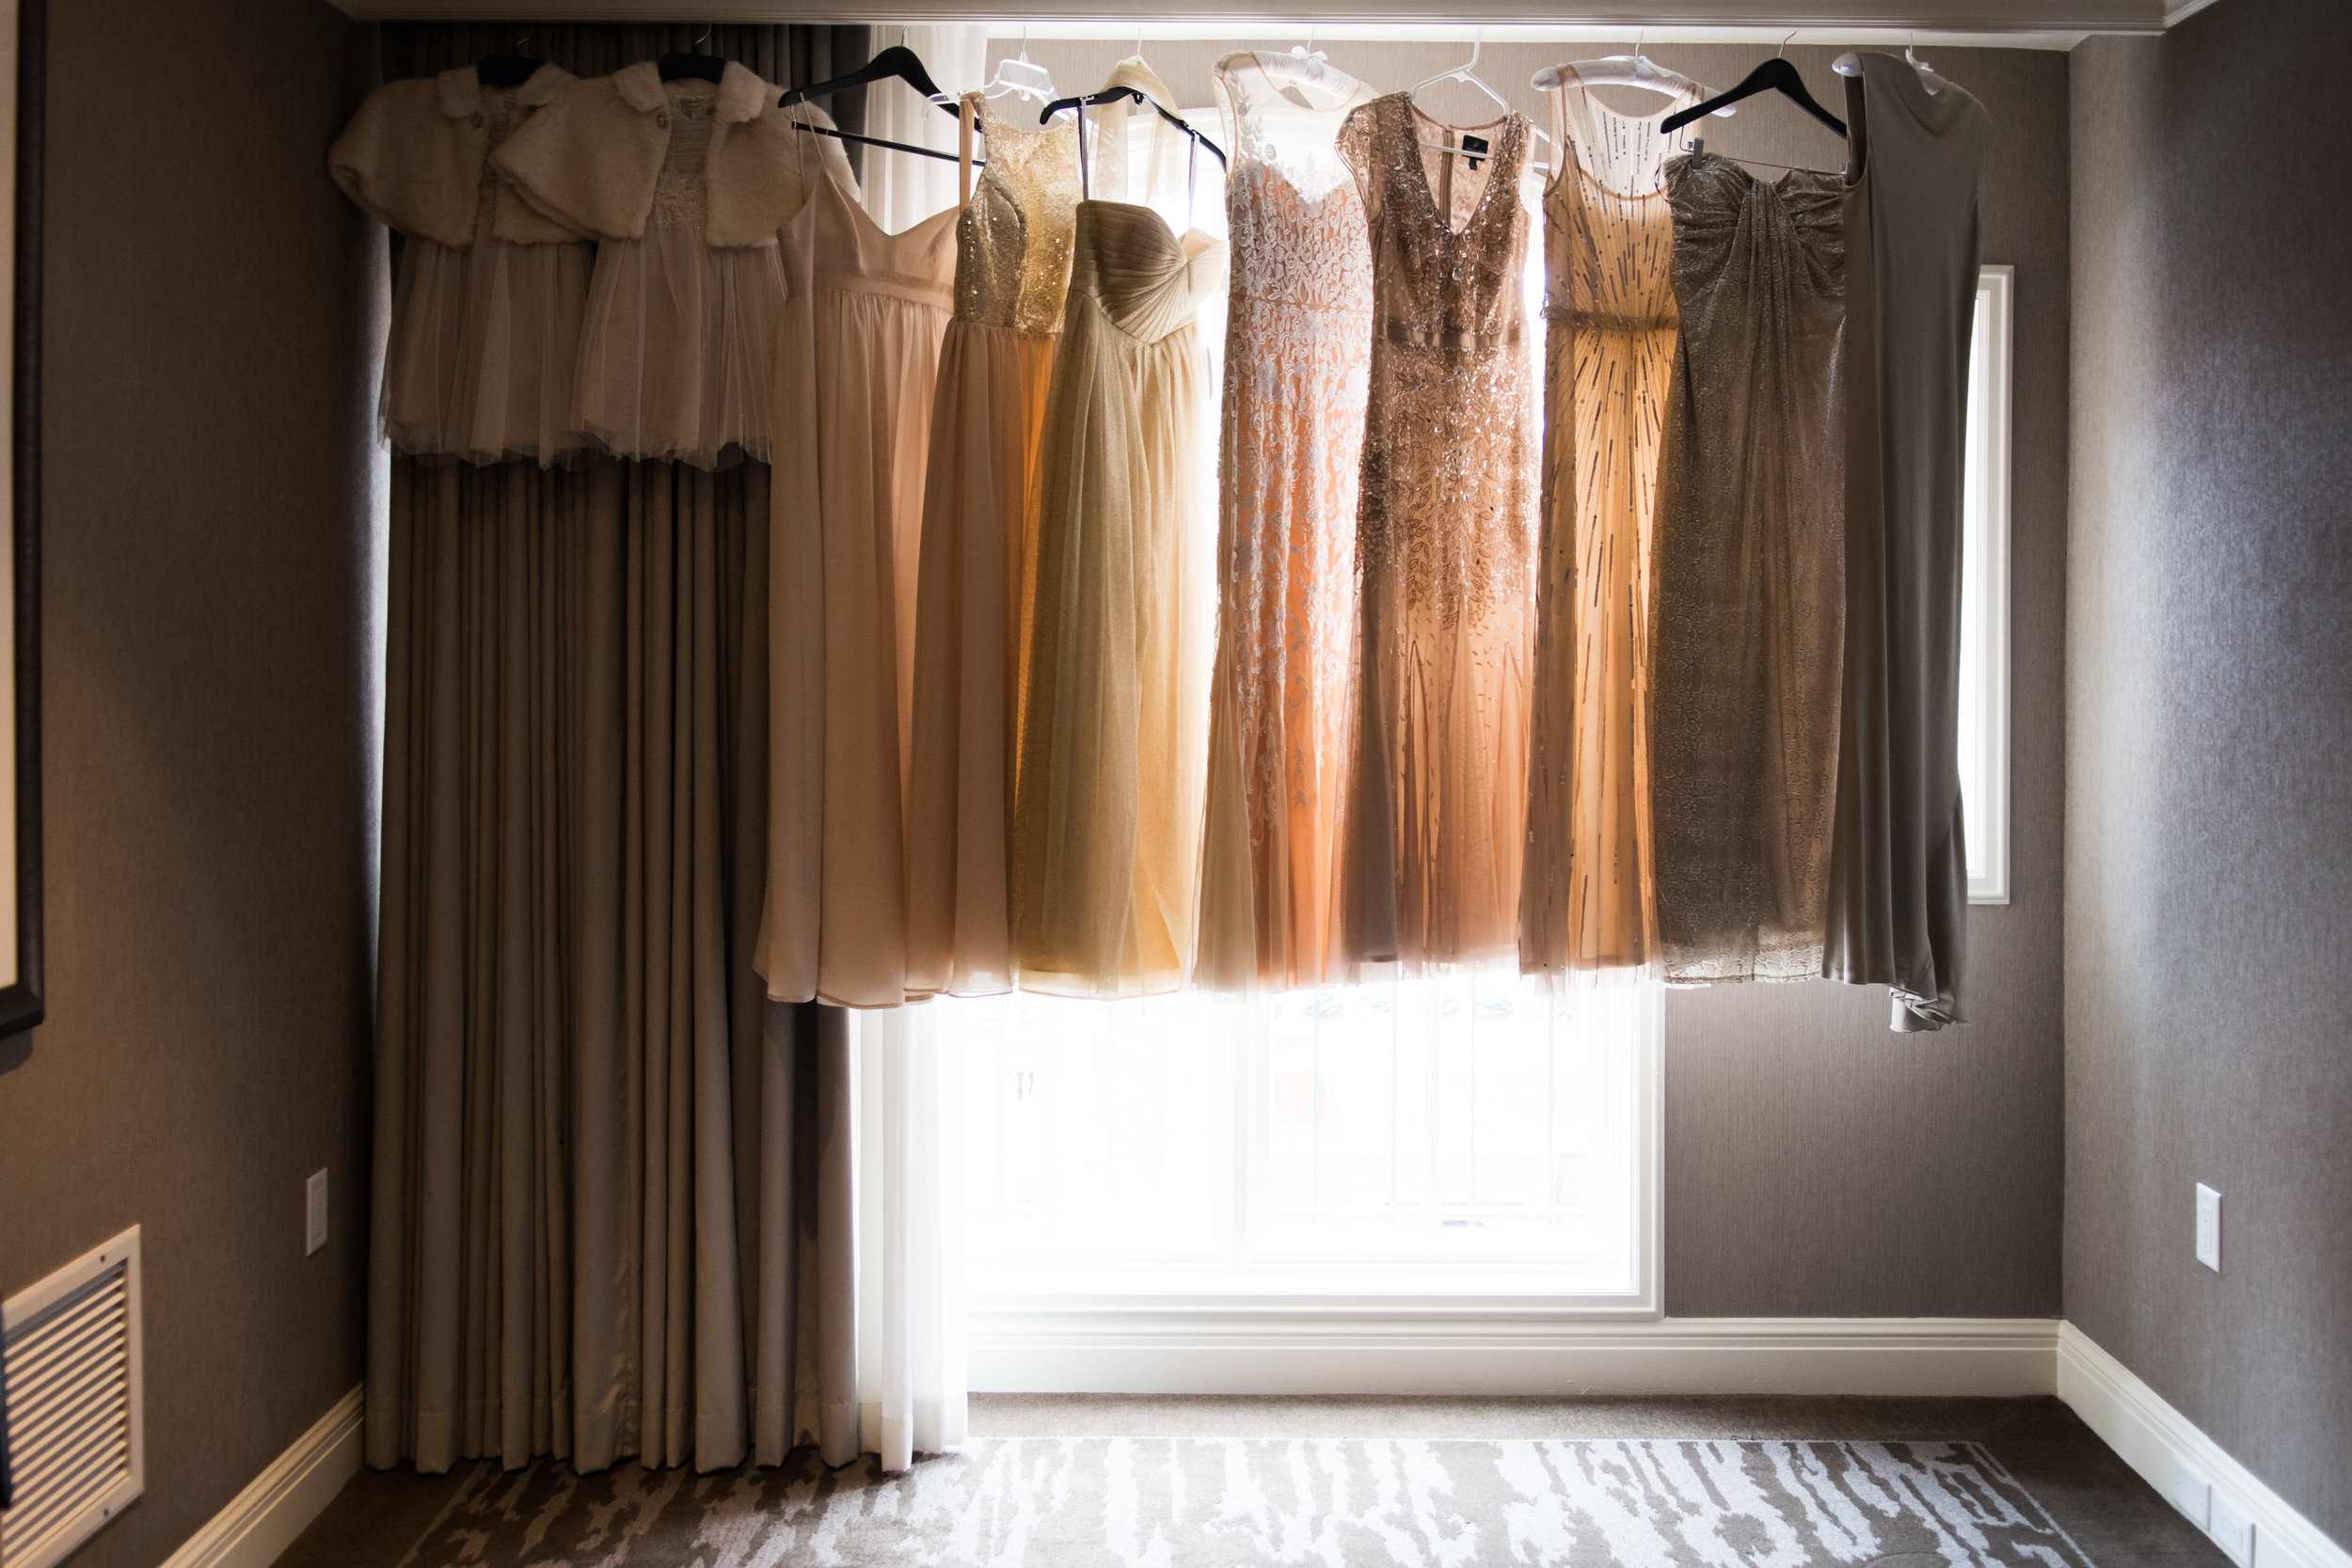 Blush Bridesmaids Dresses Hanging in Window